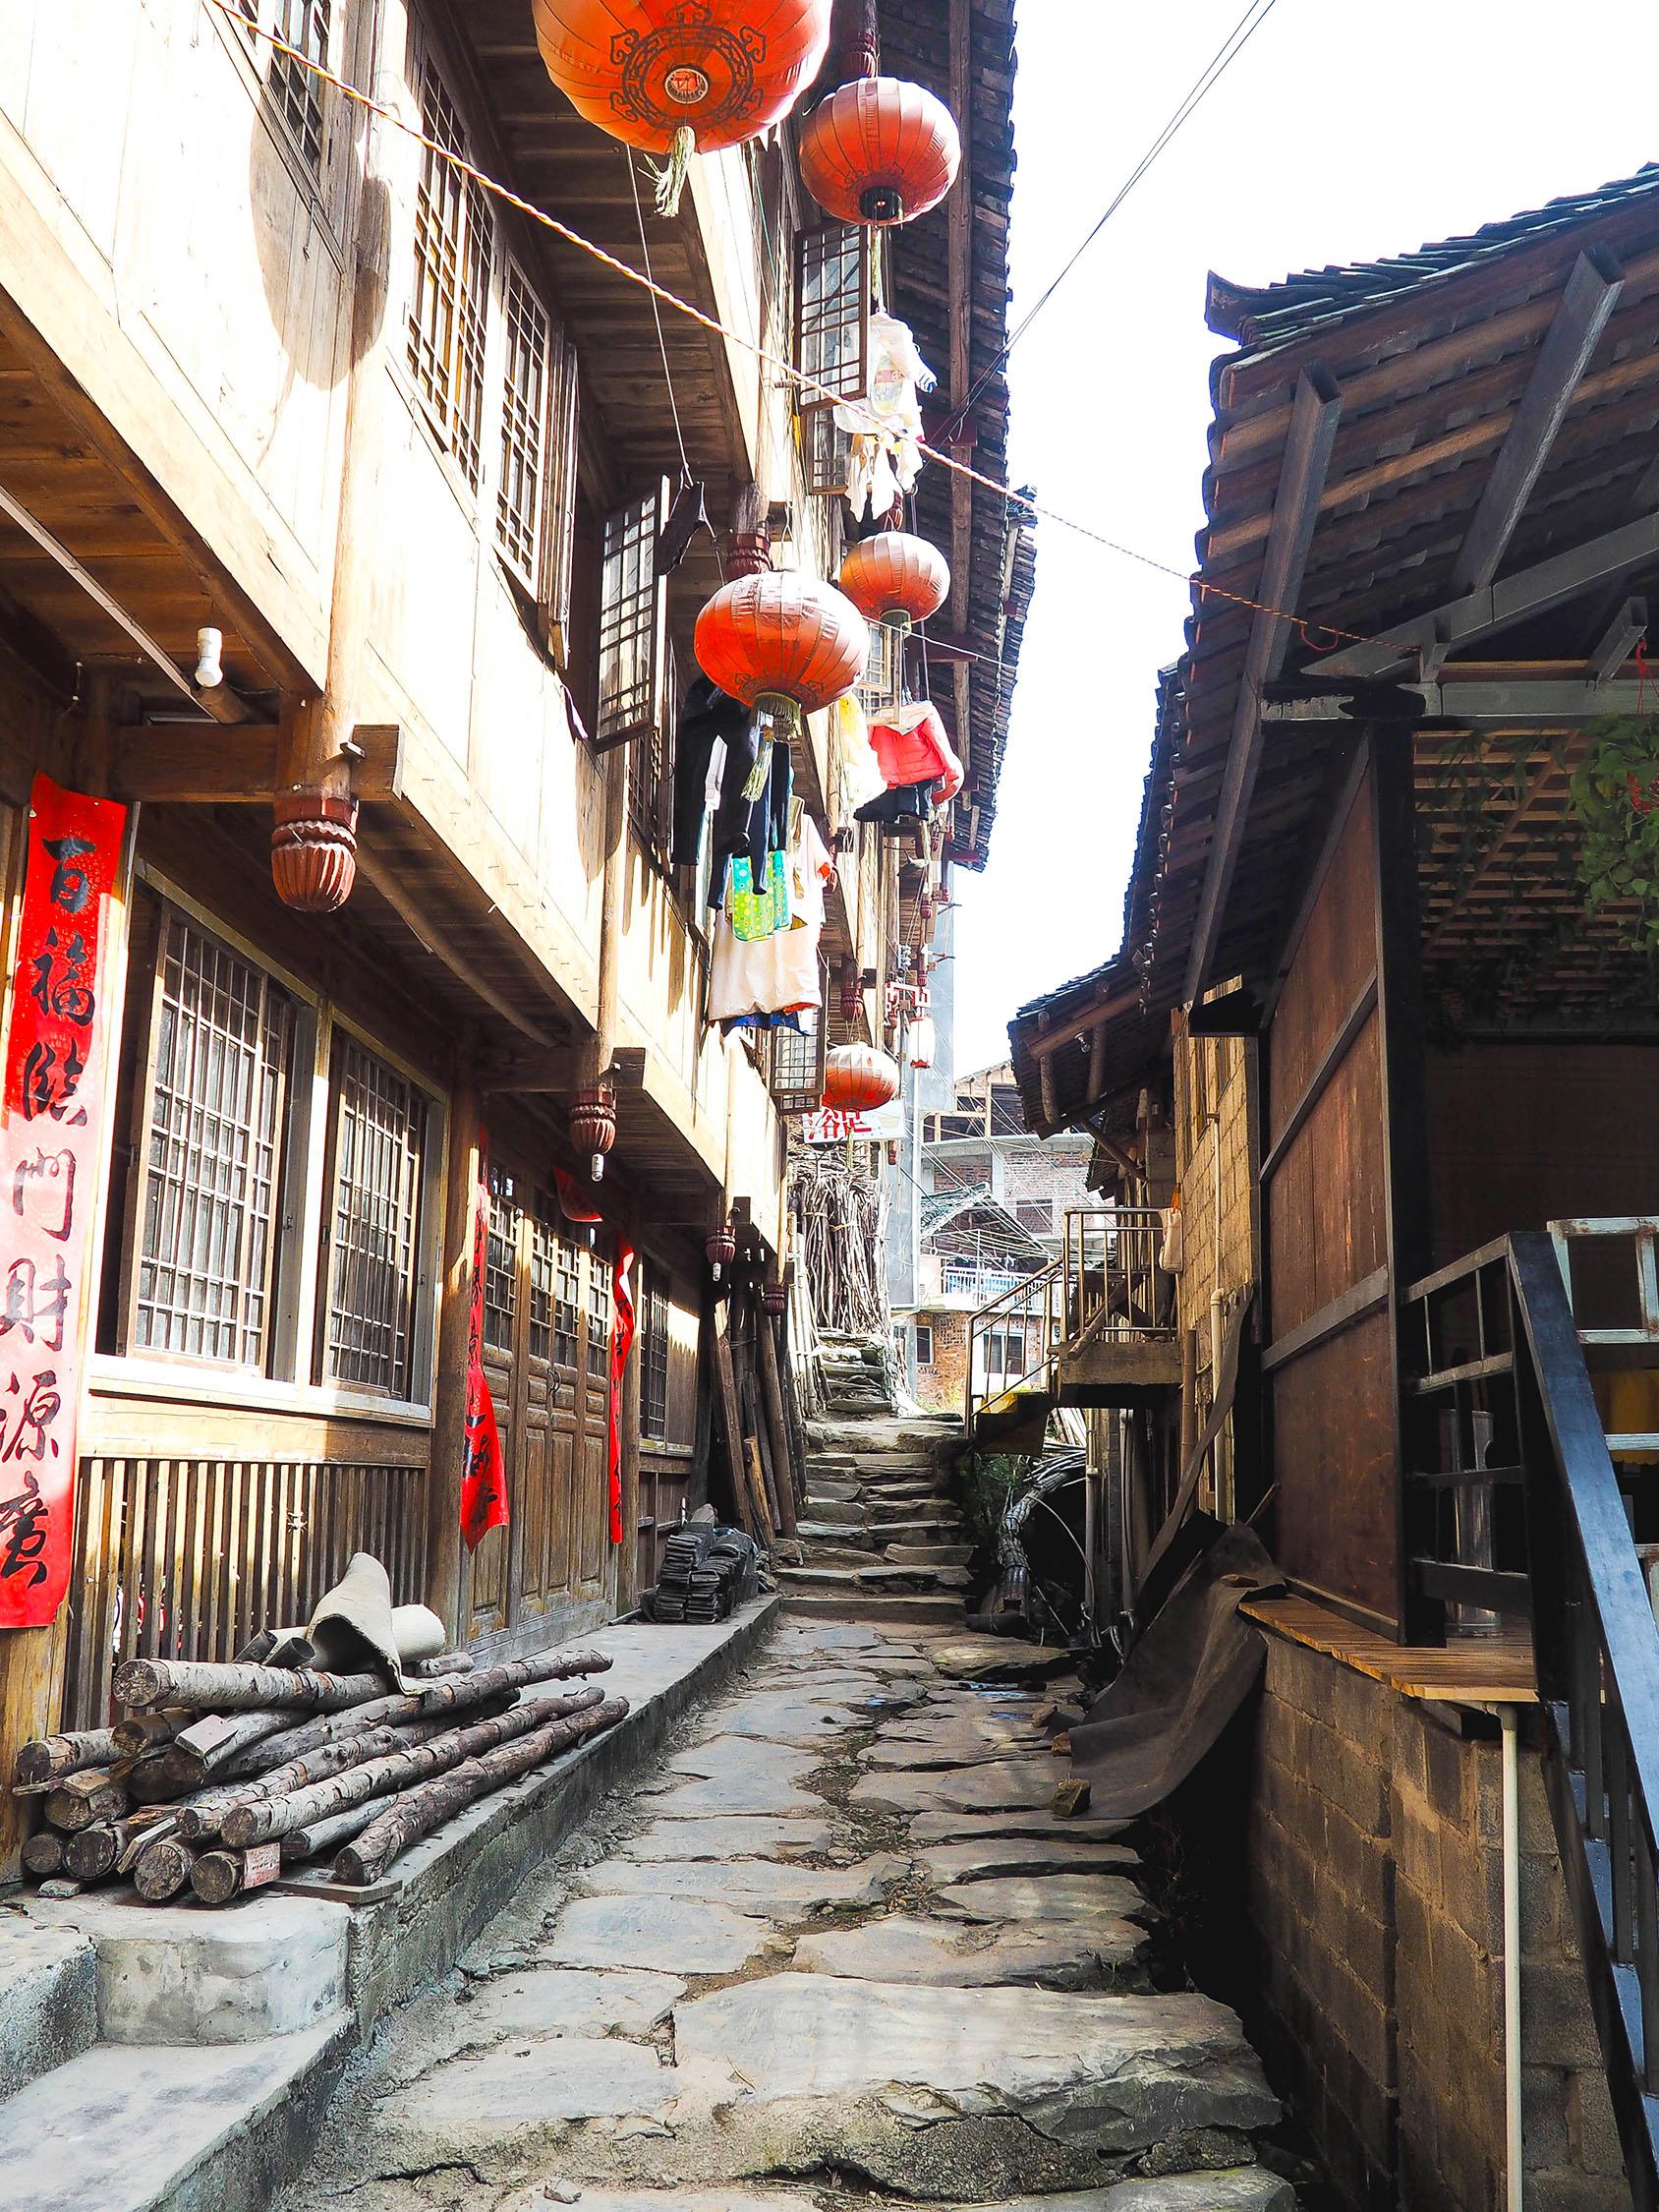 visiting the longsheng rice terraces